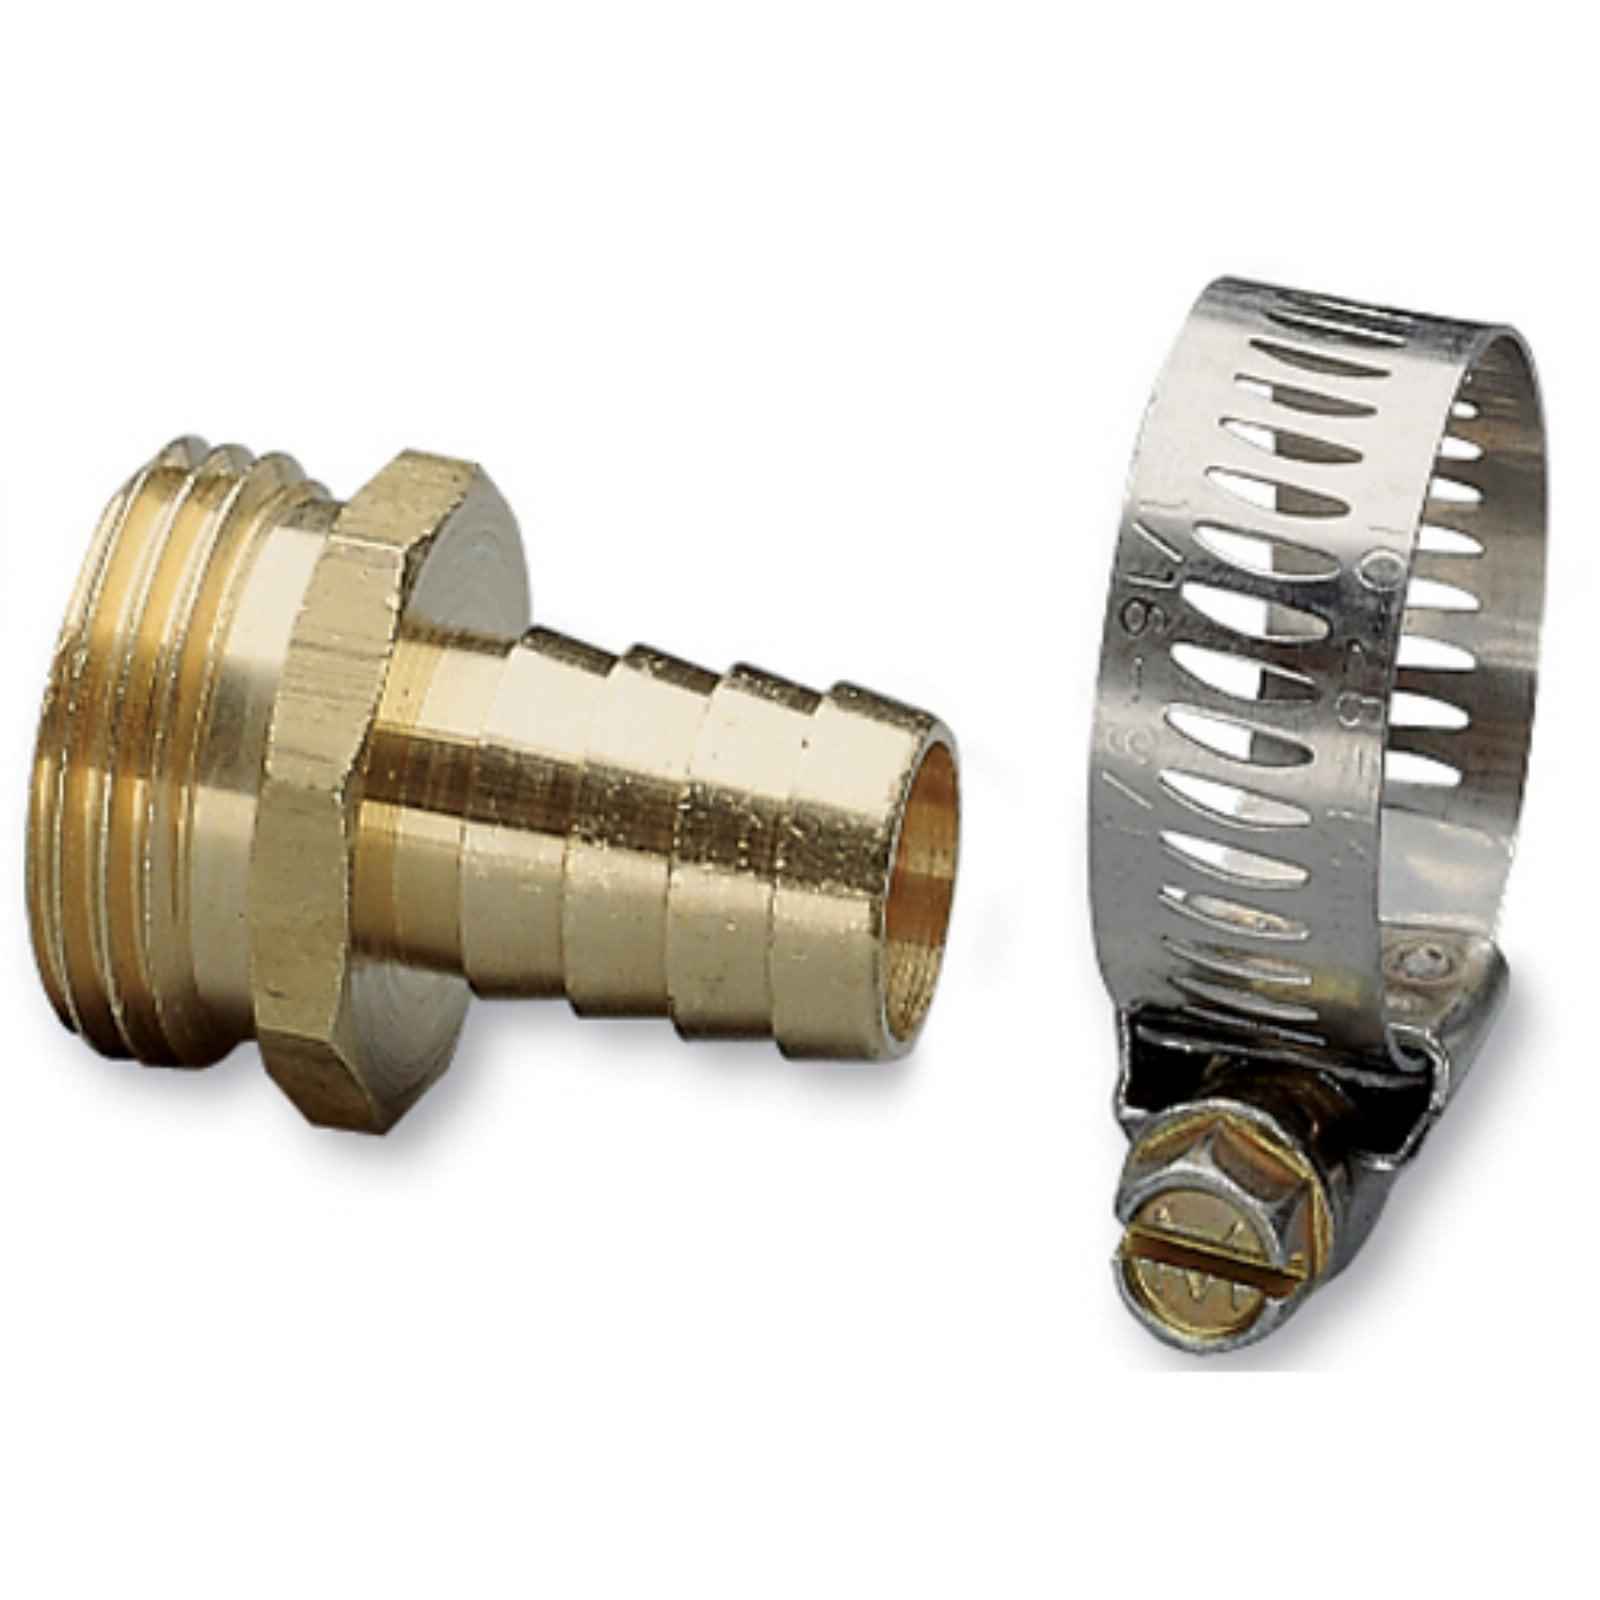 "Nelson 50450 5/8"" Brass & Worm Gear Clamp Male Hose Repair"